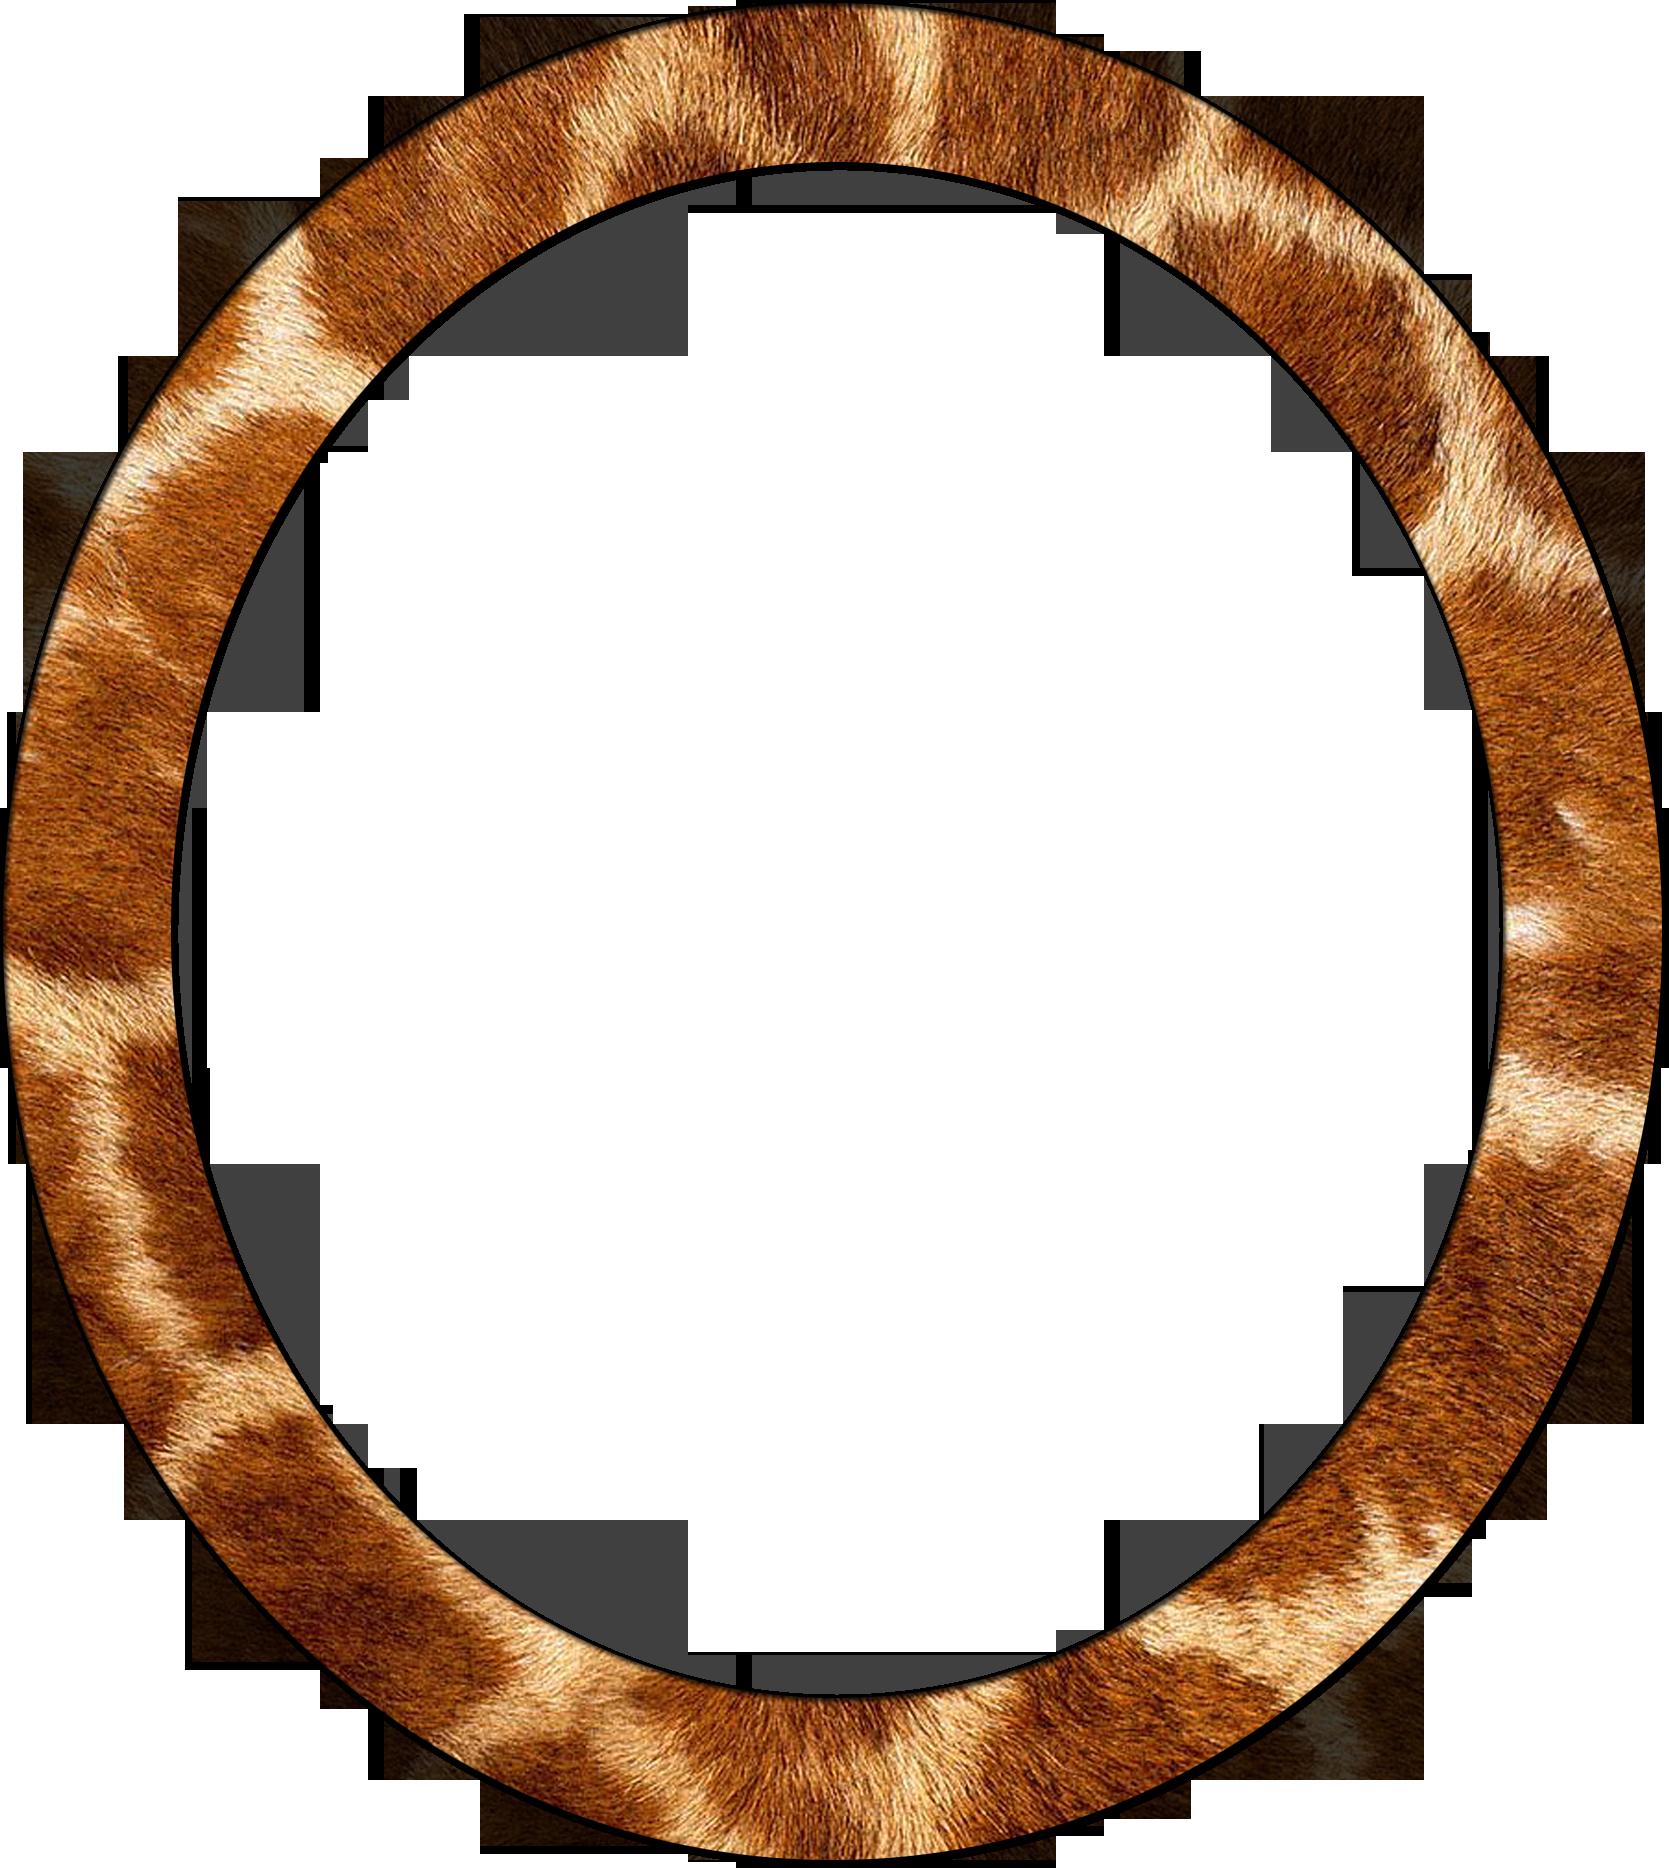 Рамка для фото круглая дерево